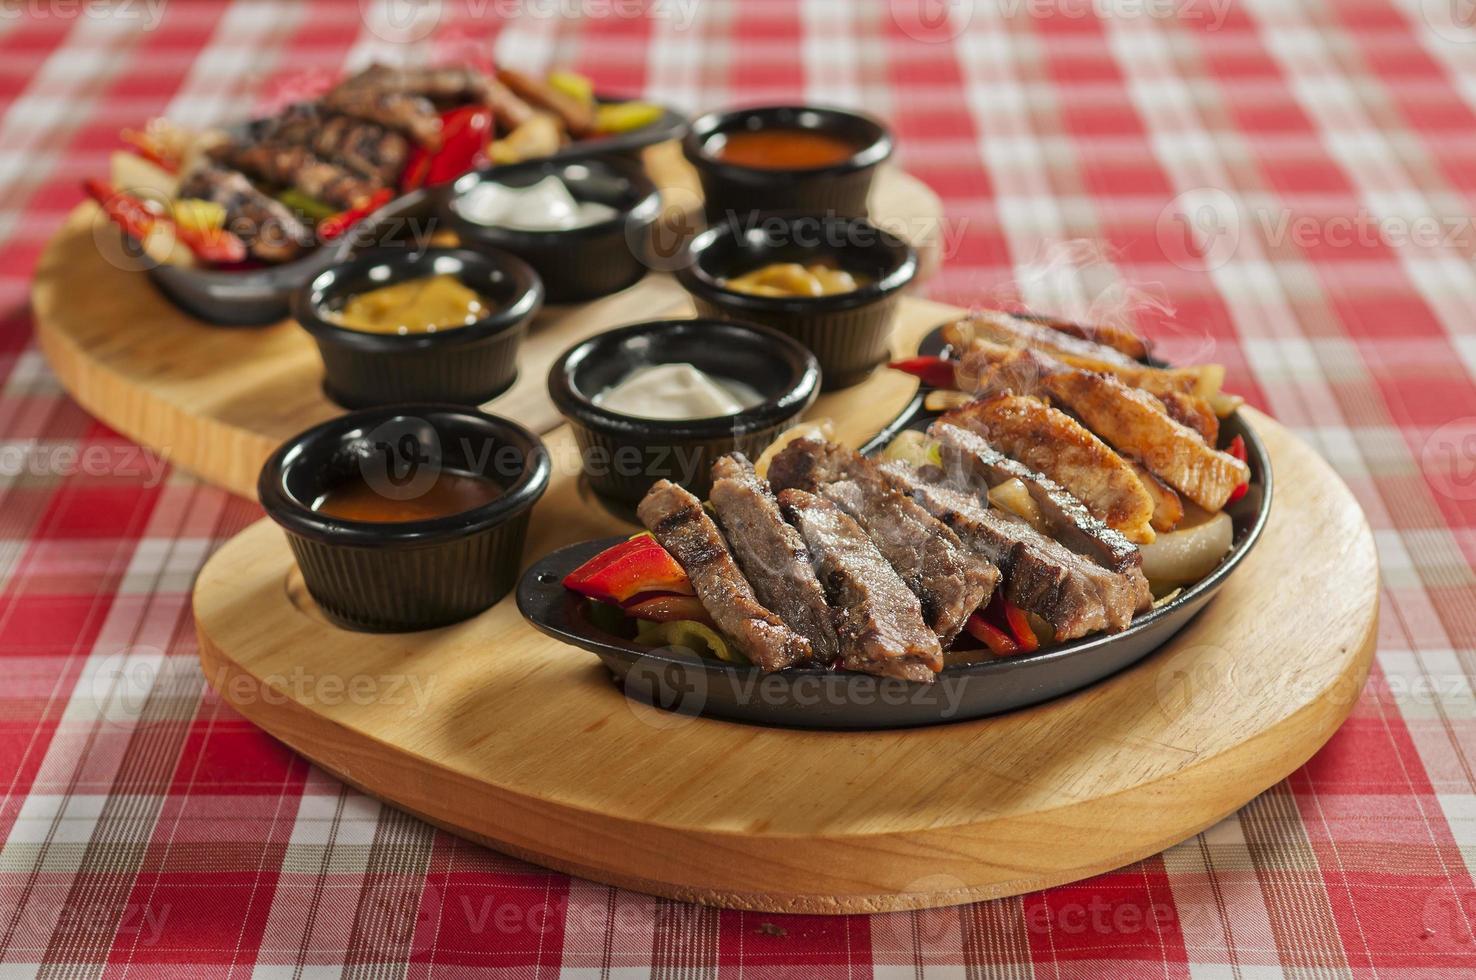 Chicken and Steak Fajitas photo